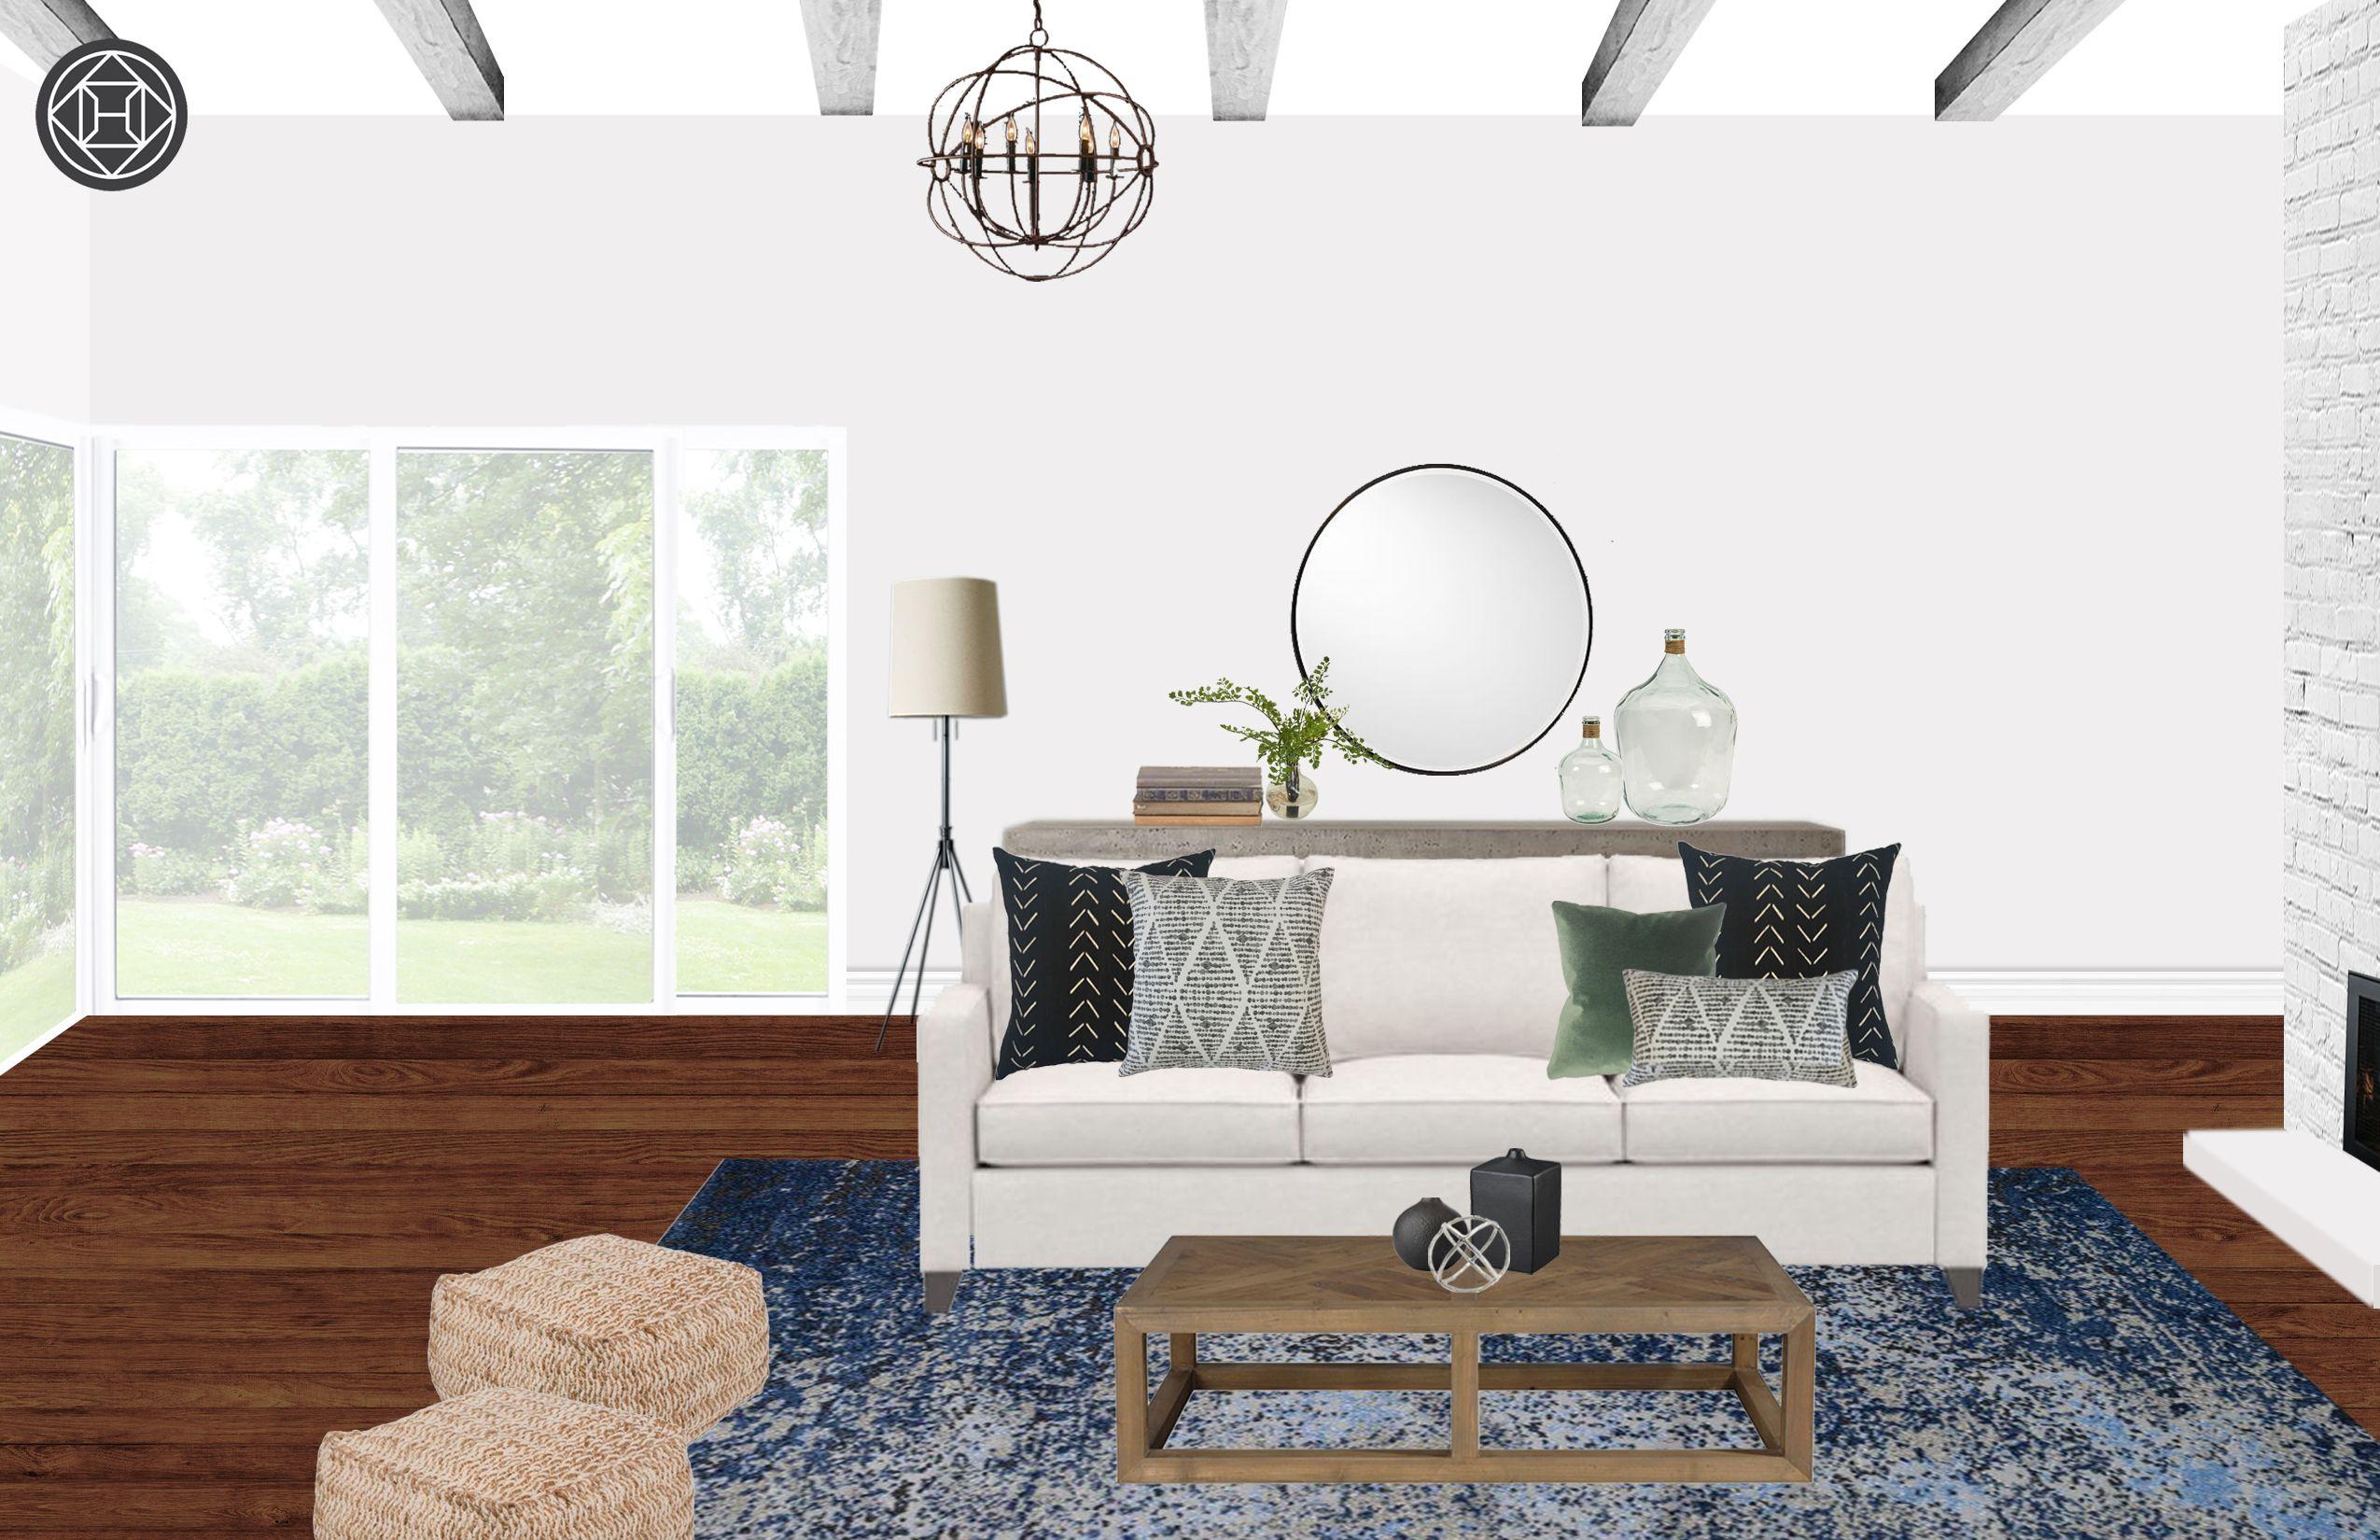 Classic Rustic Midcentury Modern Living Room Design By Hav